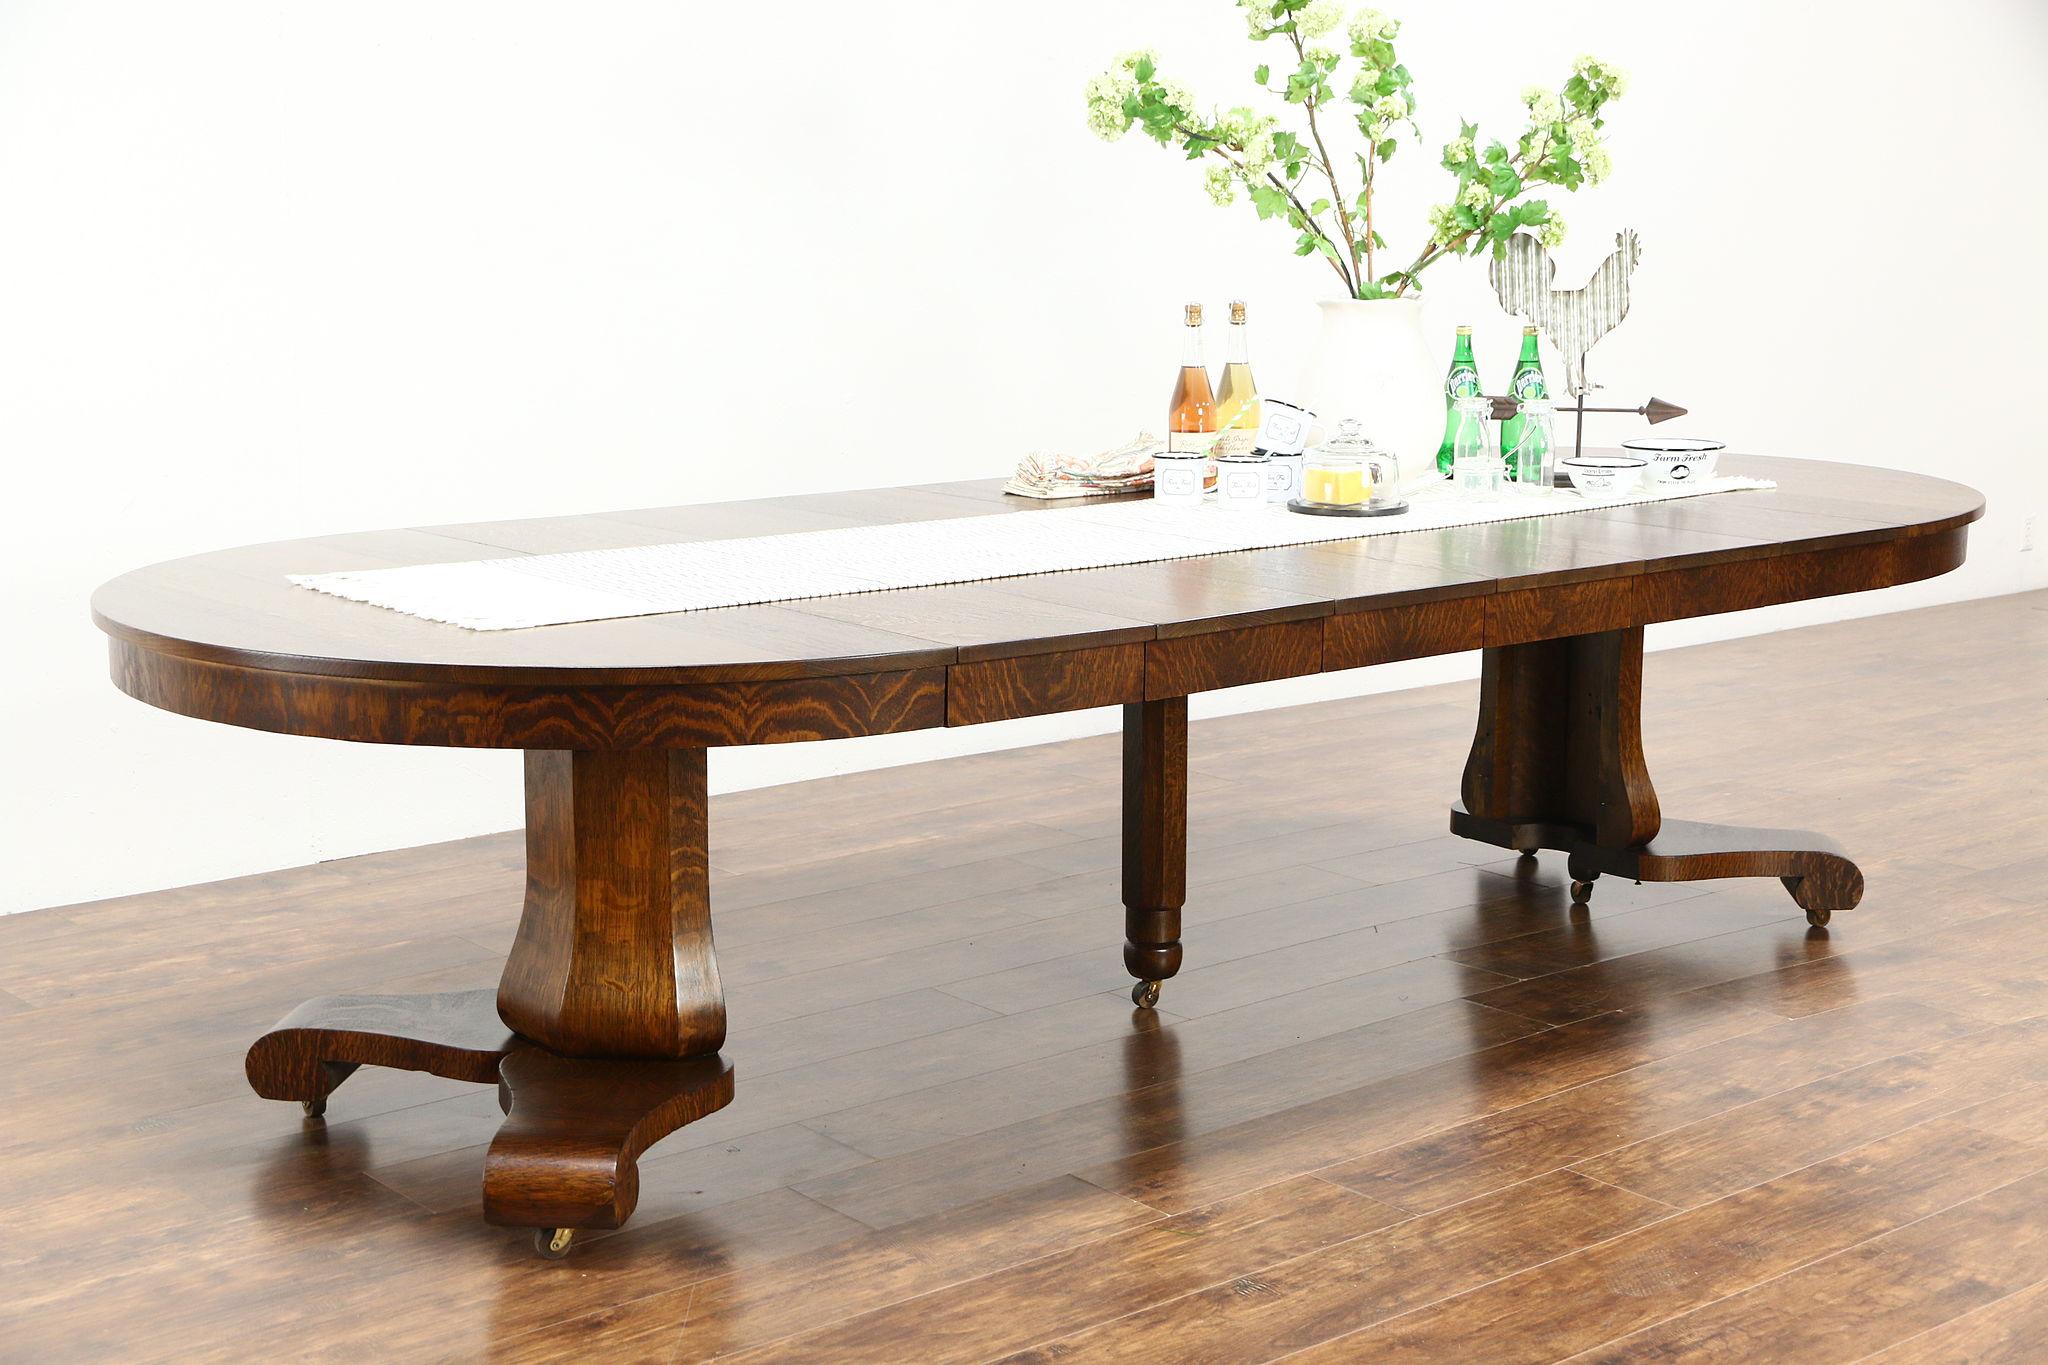 sold round antique empire 54 pedestal dining table 6 leaves signed extends 10 39 5 harp. Black Bedroom Furniture Sets. Home Design Ideas